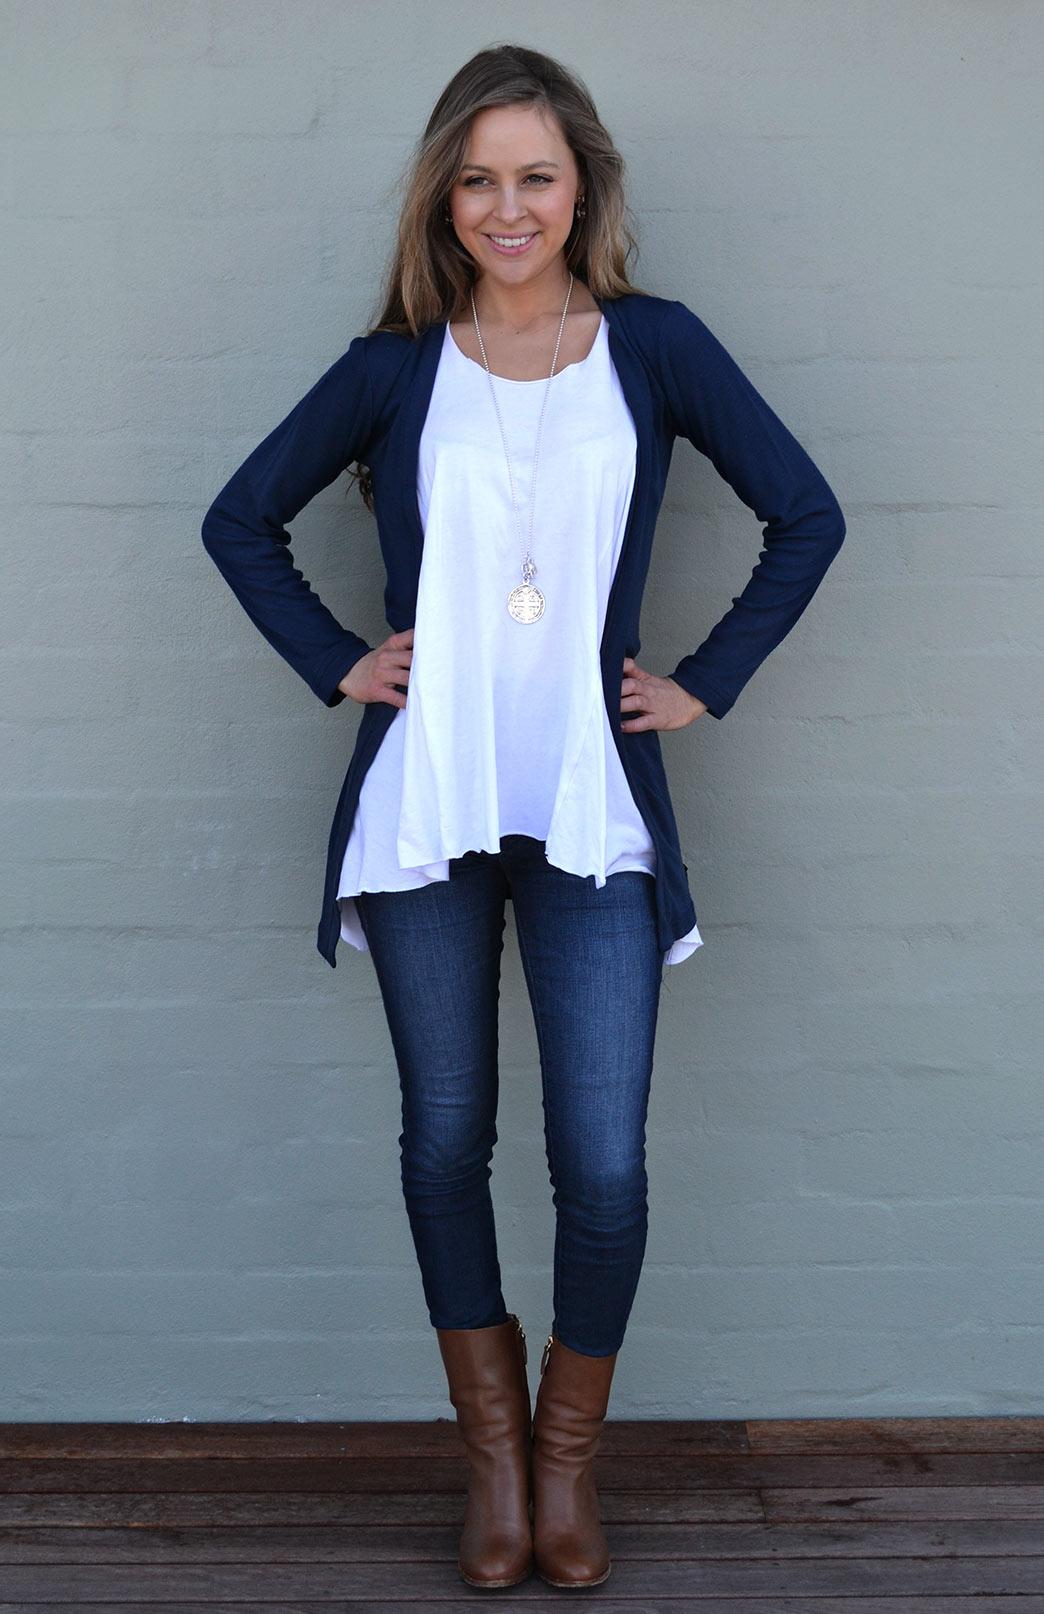 Slimline Cardigan - Women's Classic Dark Indigo Blue Long Sleeve Simple Merino Wool Cardigan - Smitten Merino Tasmania Australia